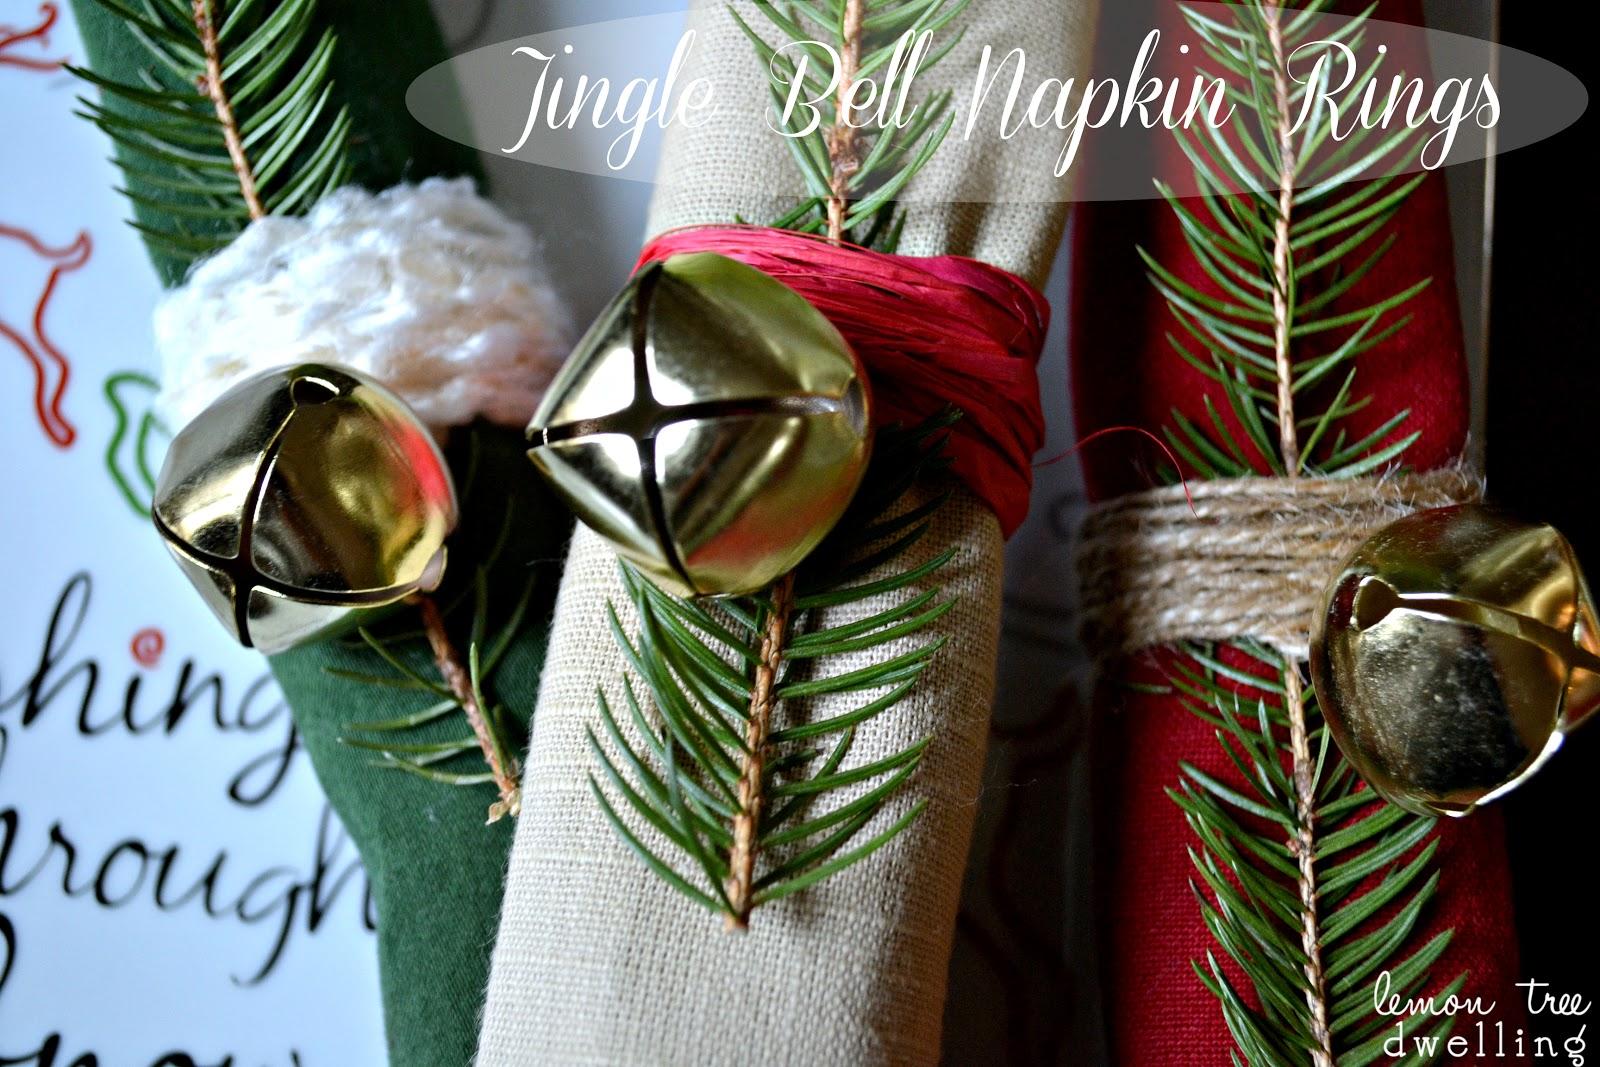 Lemon Tree Dwelling Jingle Bell Napkin Rings